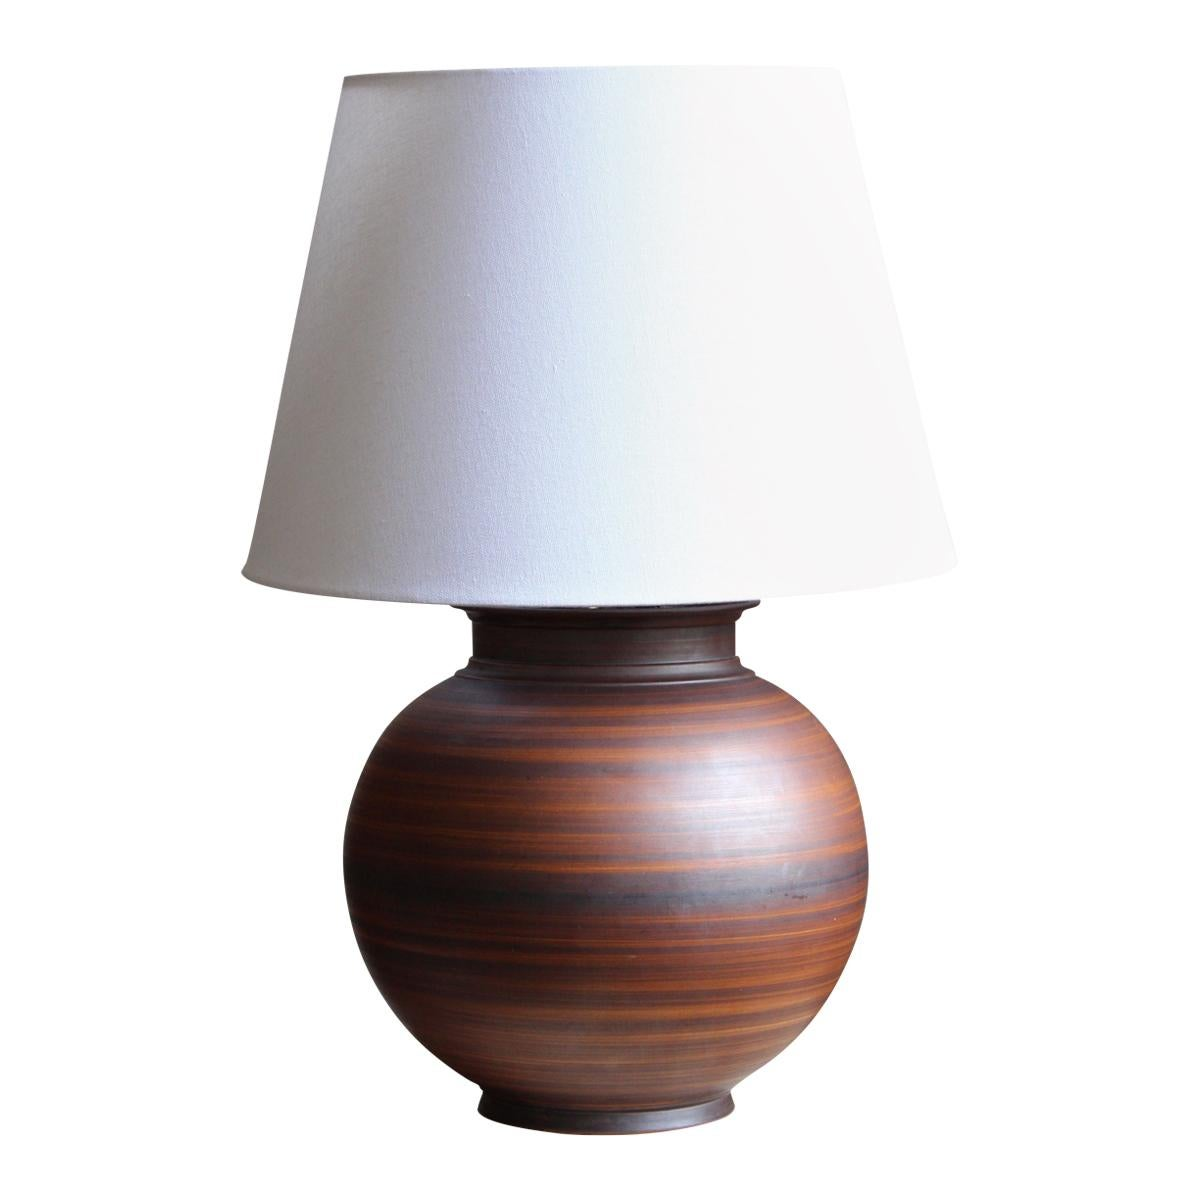 Lidköpings Porslinsfabrik Large Table Lamp Hand-Painted Earthenware Sweden 1940s